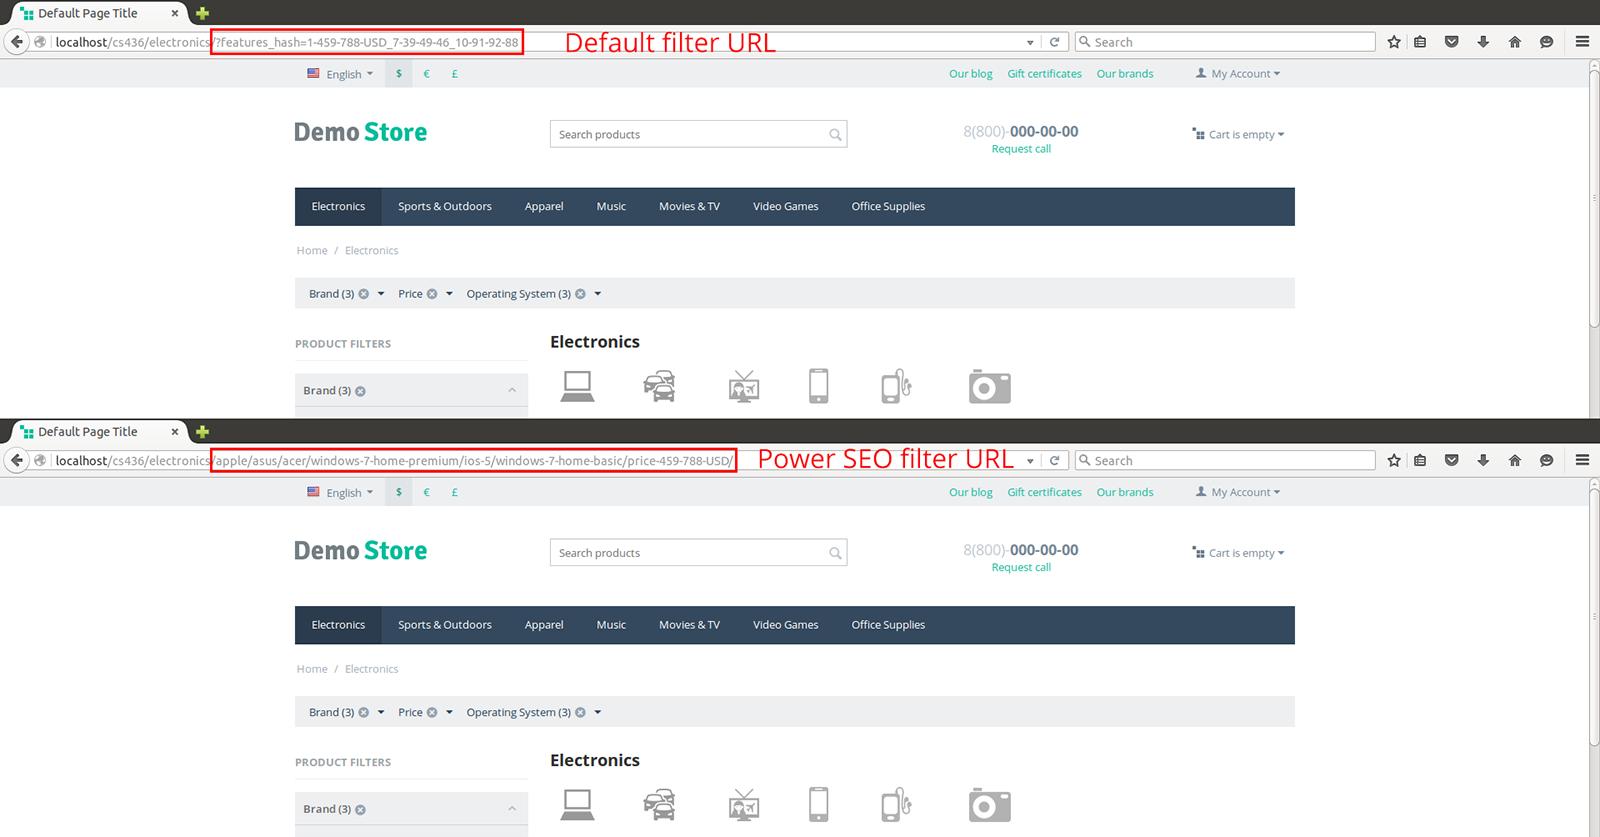 Comparison_filter_URL.png